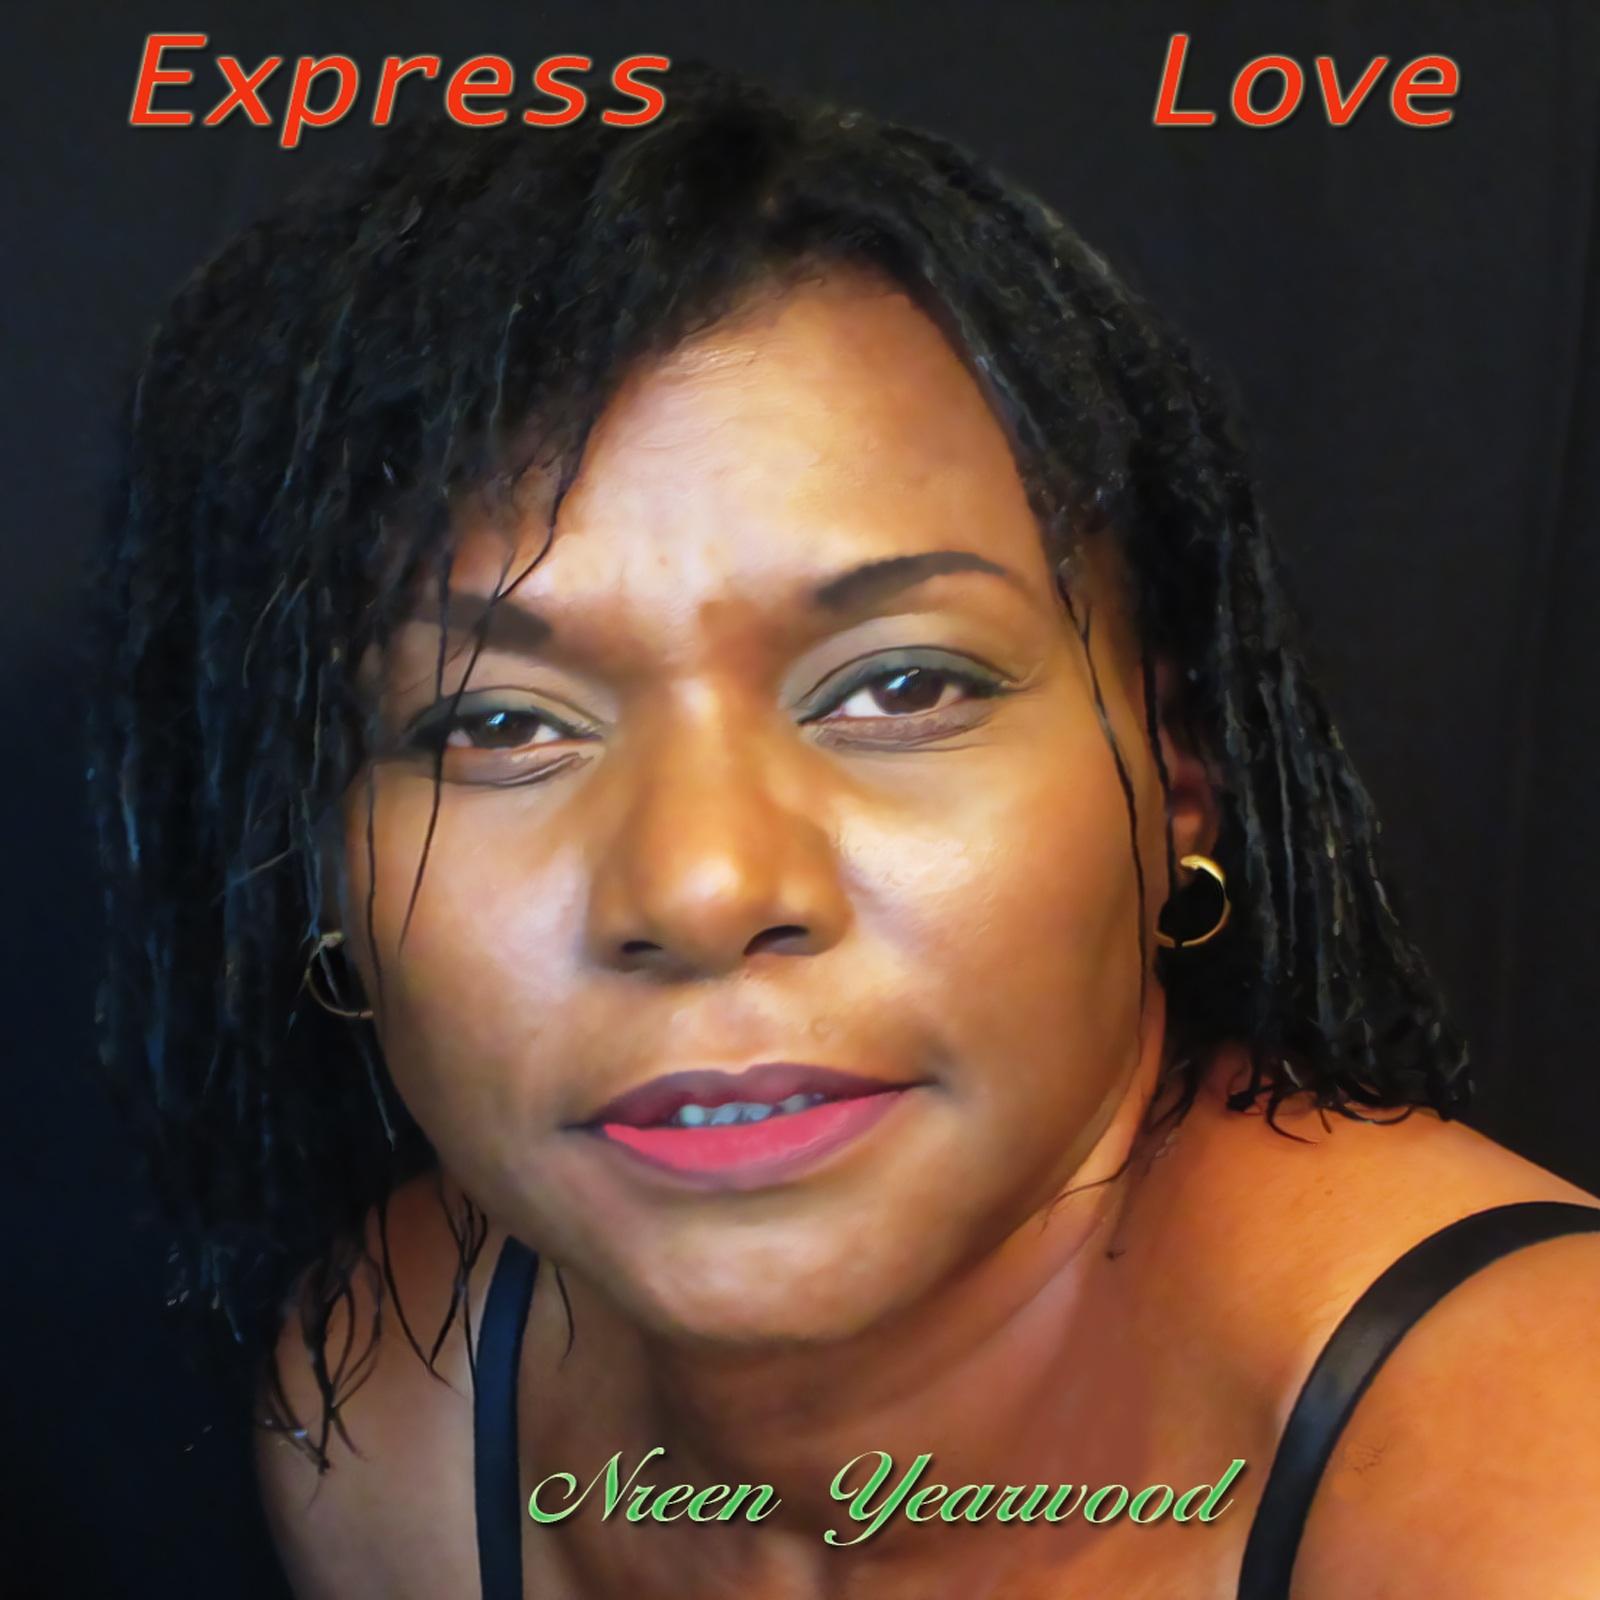 Express Love – Nreen Yearwood